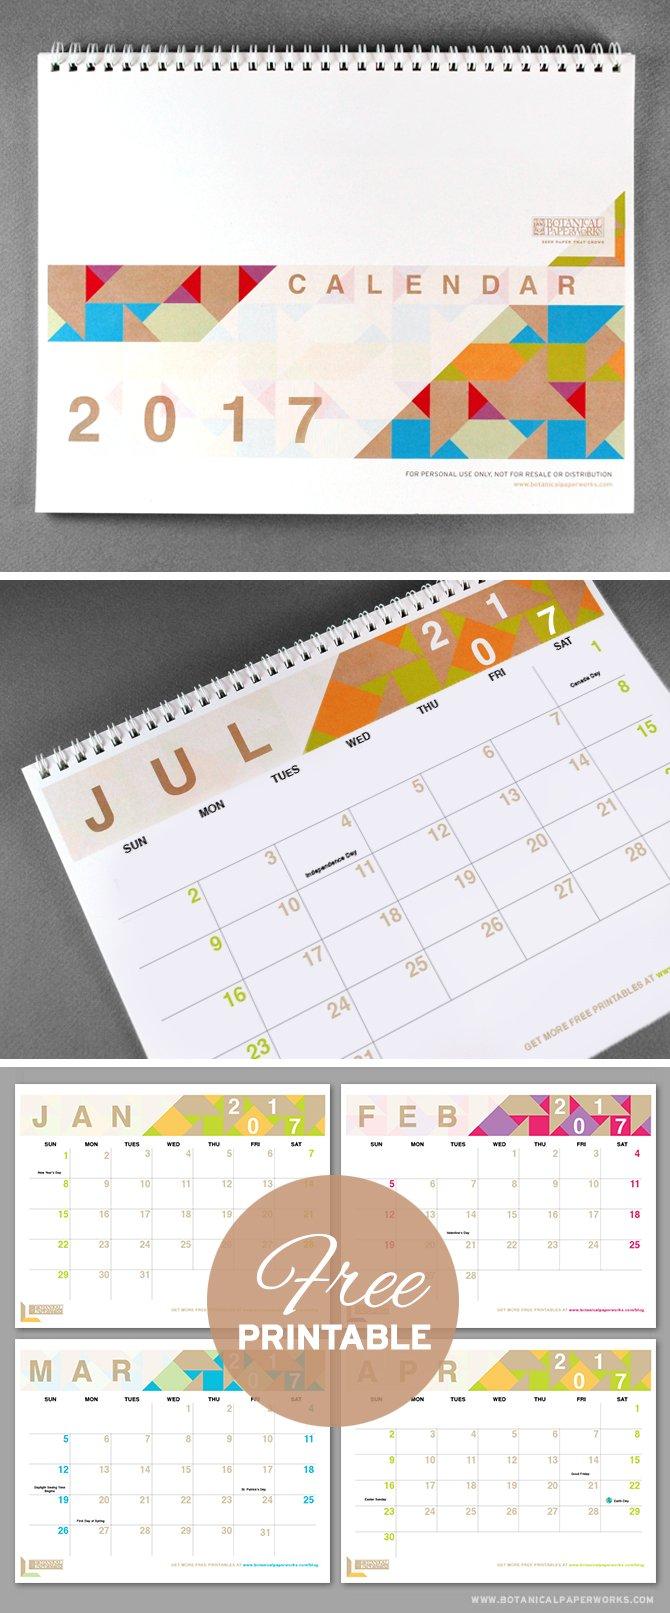 free-printable-calendar-2017-geometric-1